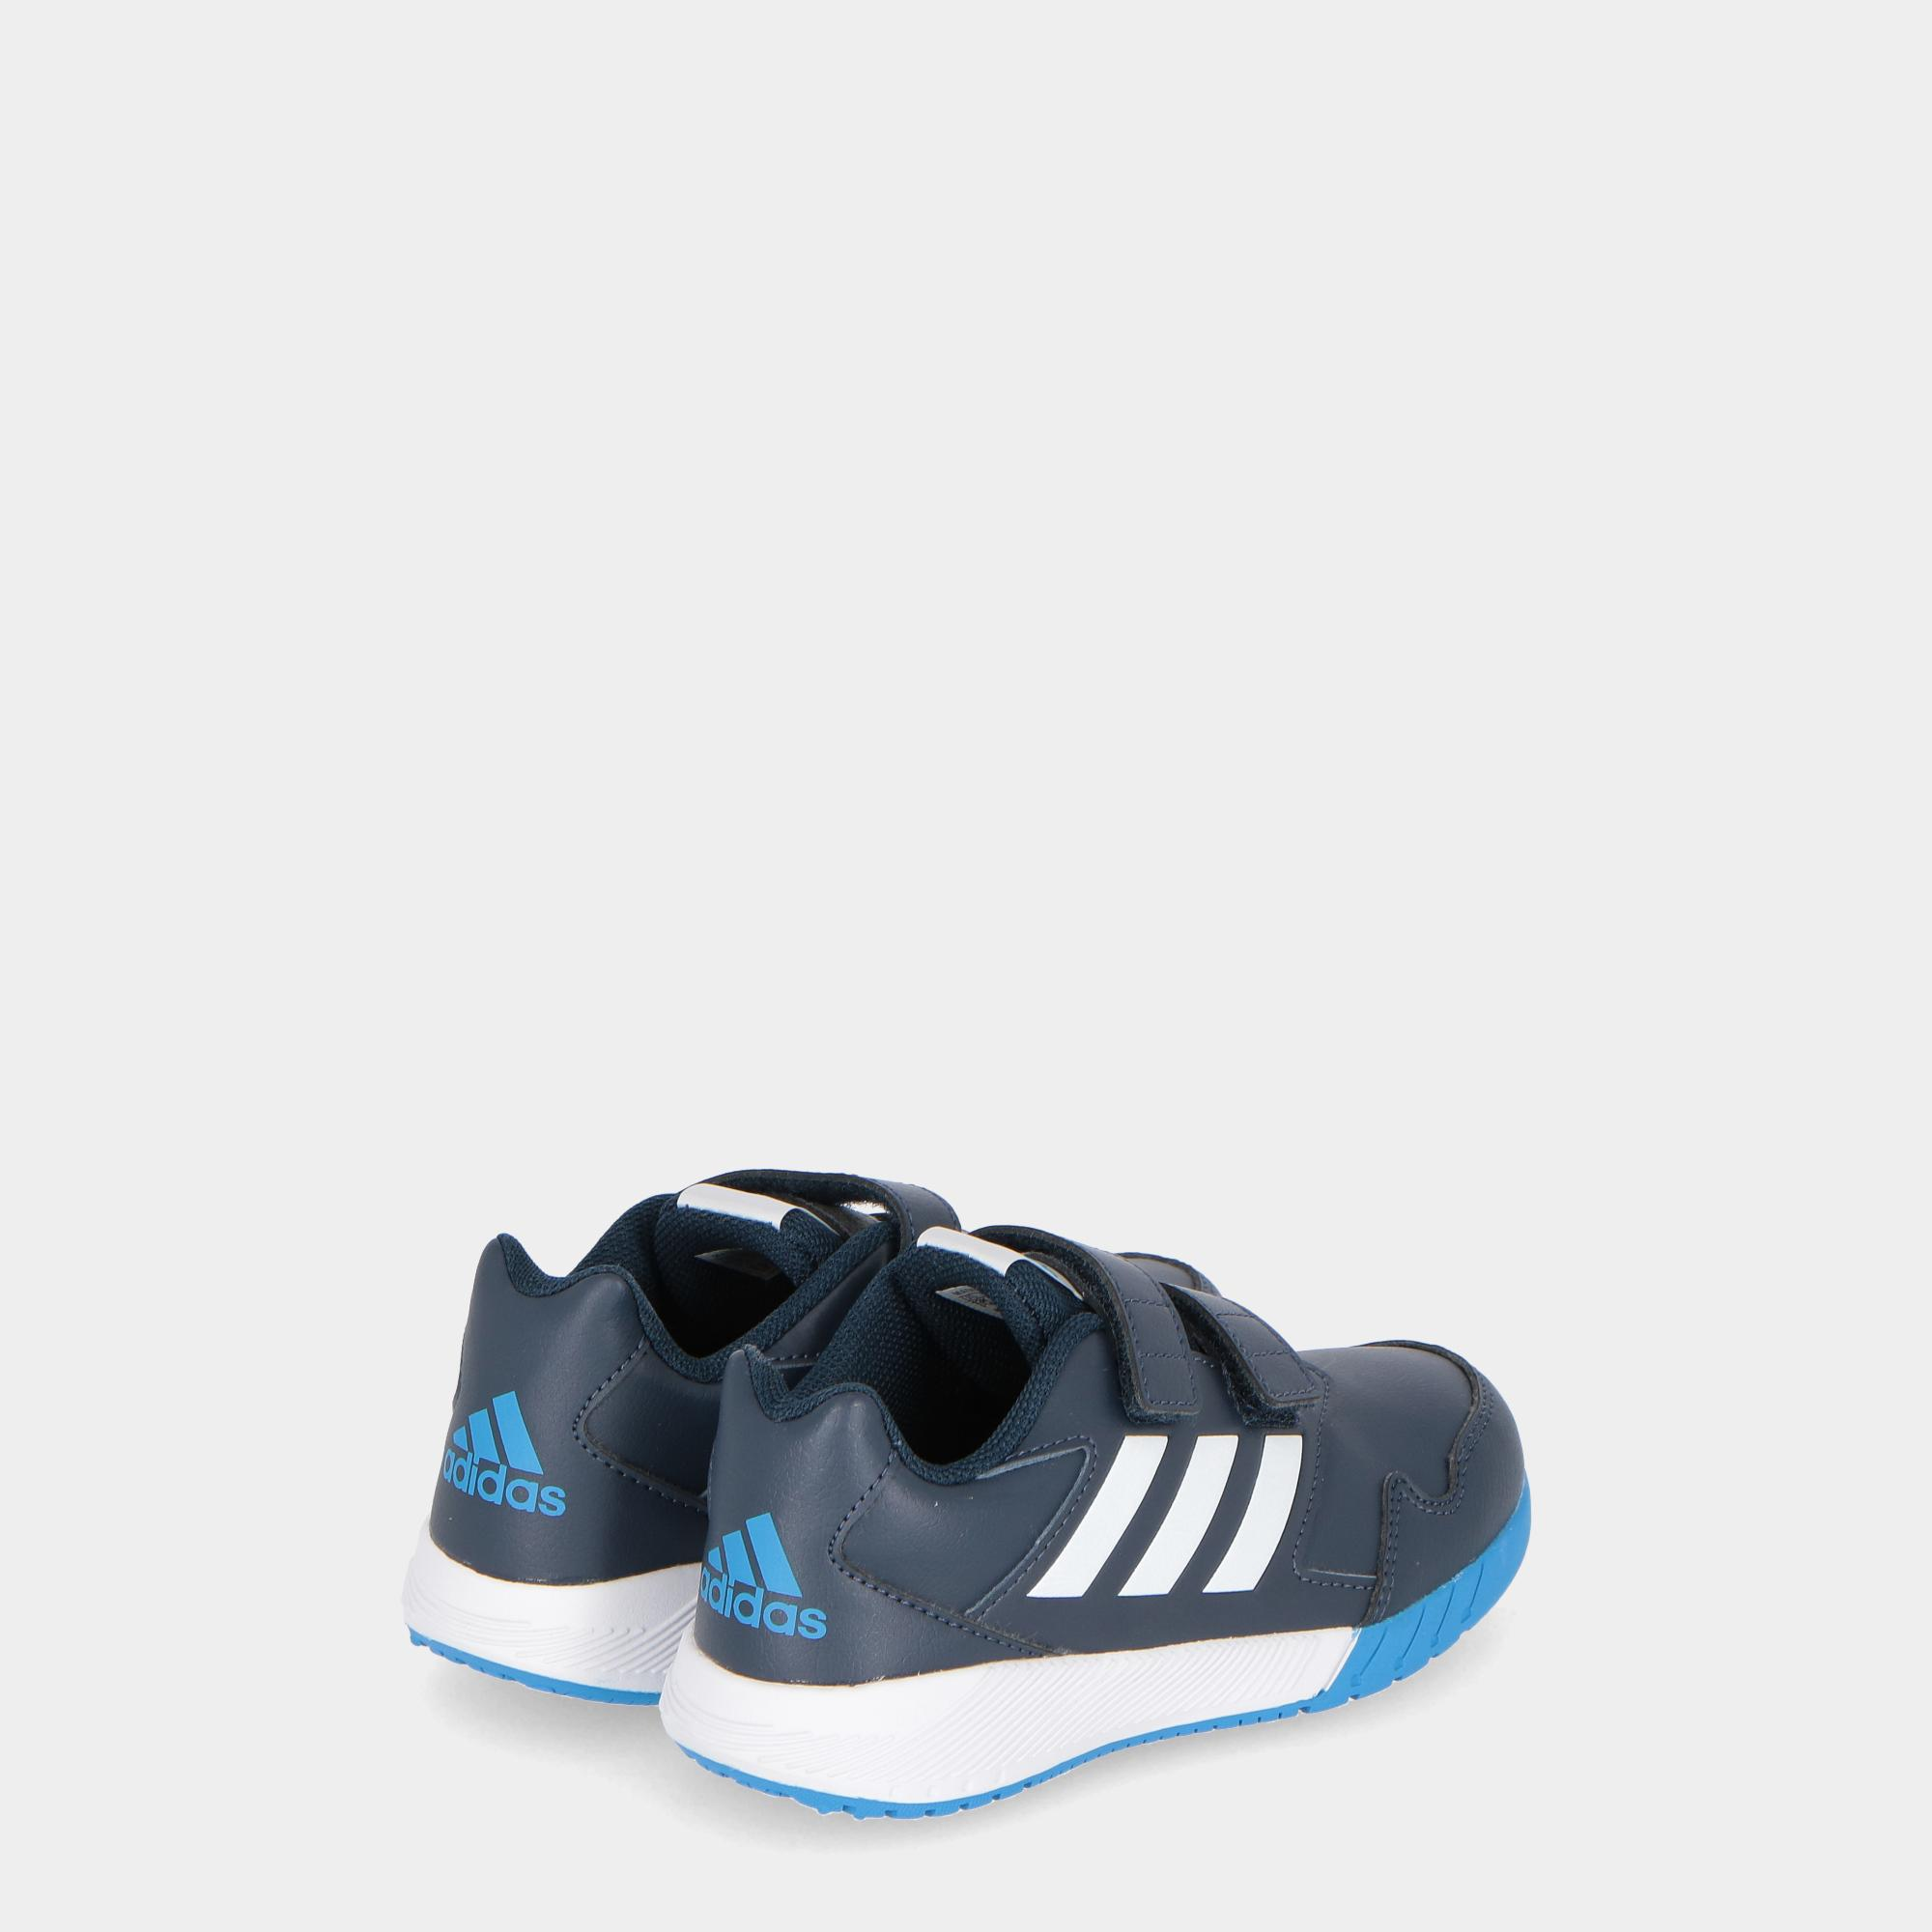 half off 9b48a f8e50 Adidas Altarun Cf K NAVY BLUE